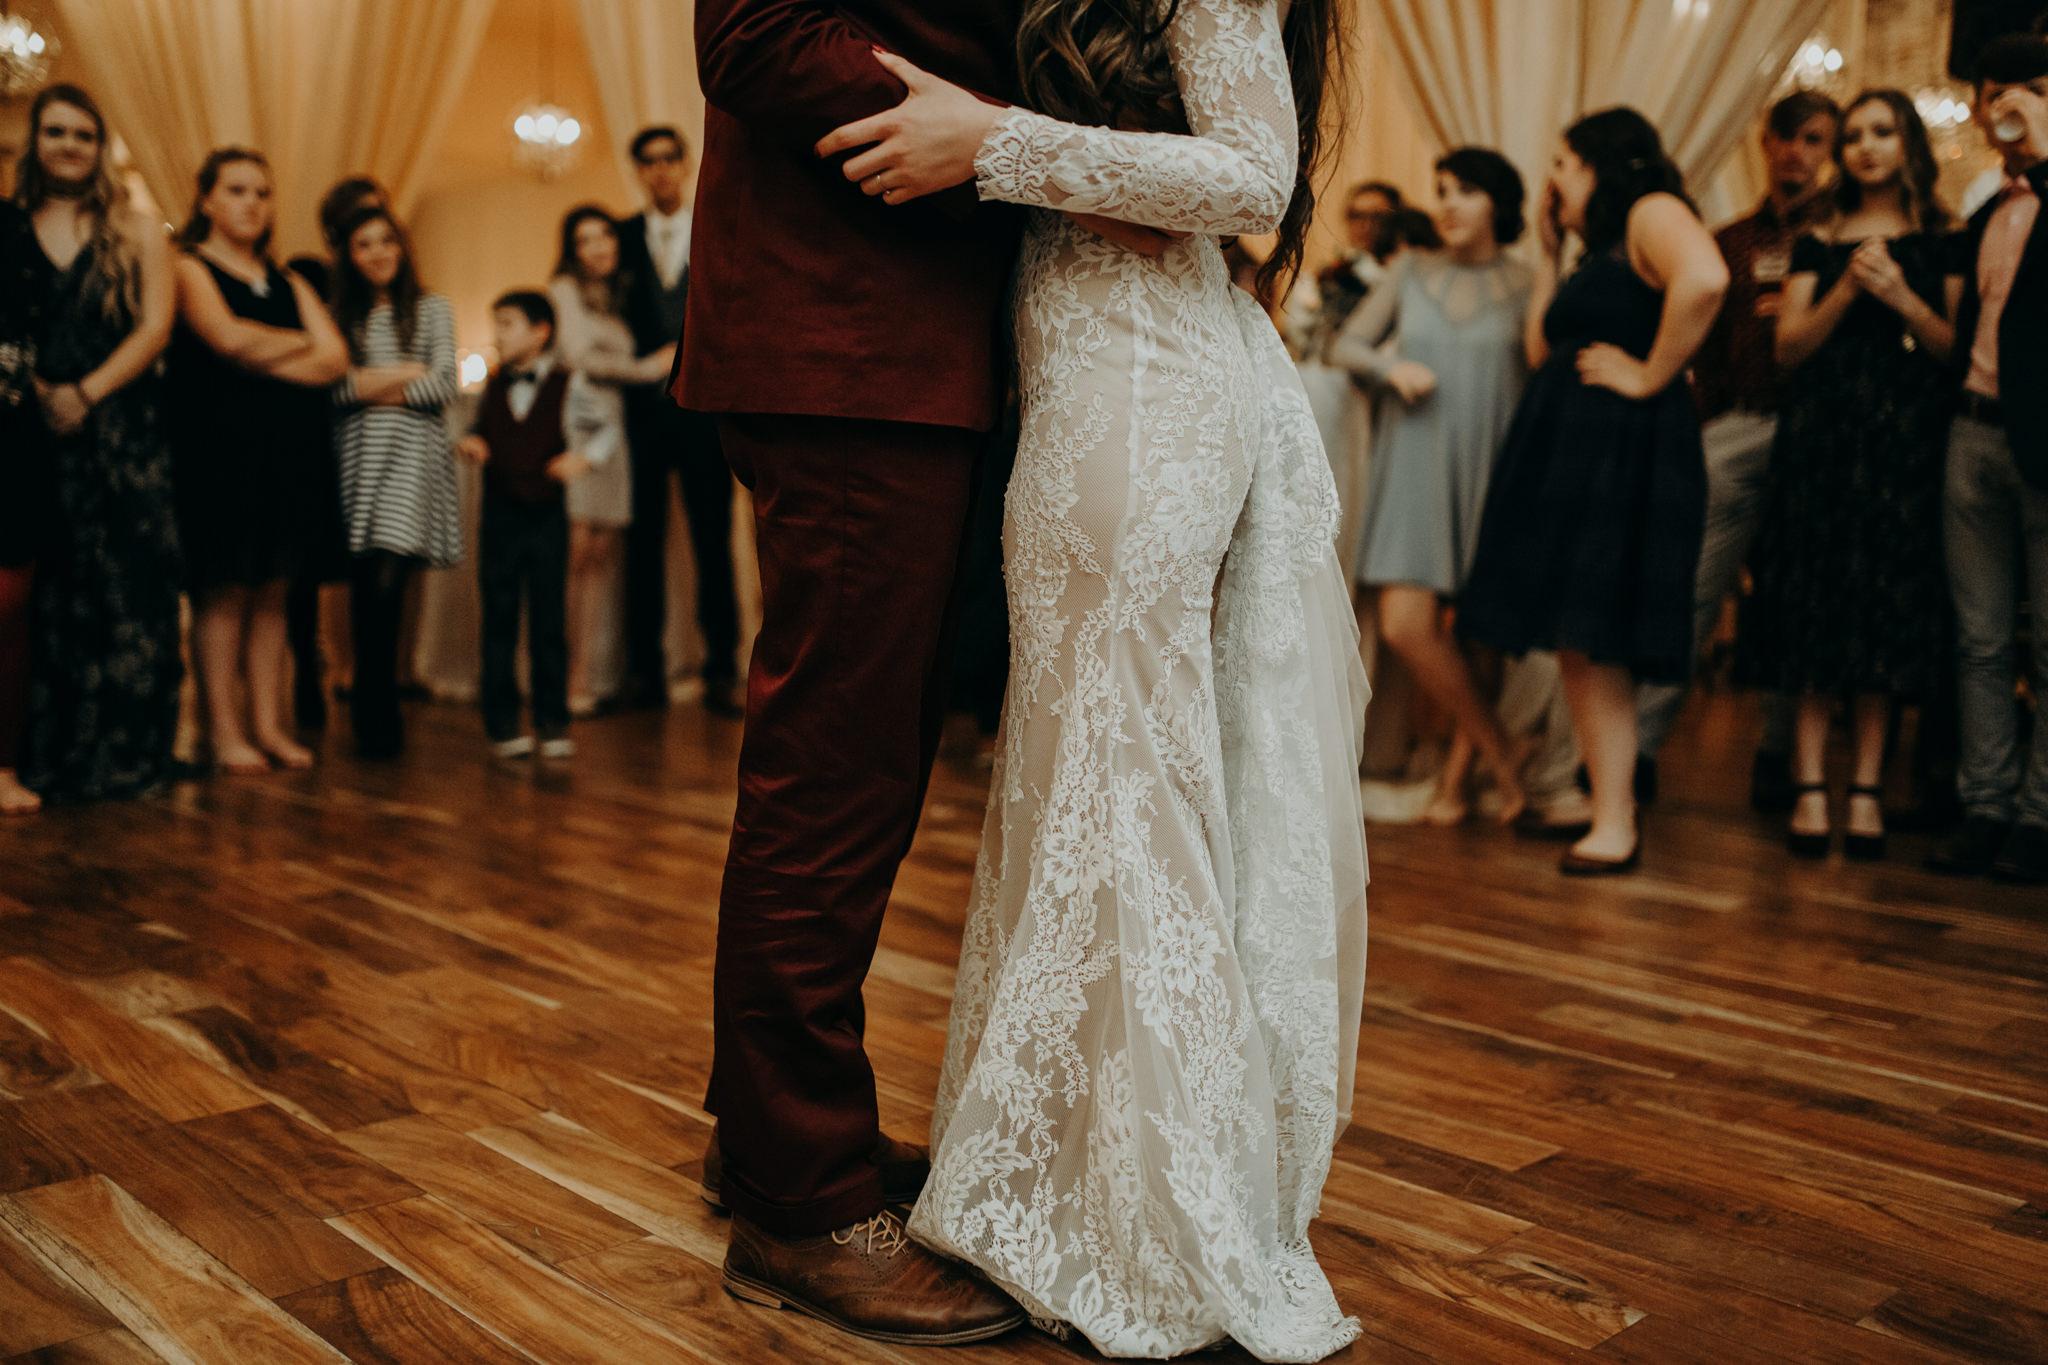 couple-wedding-indie-wedding-northern-california-132.jpg